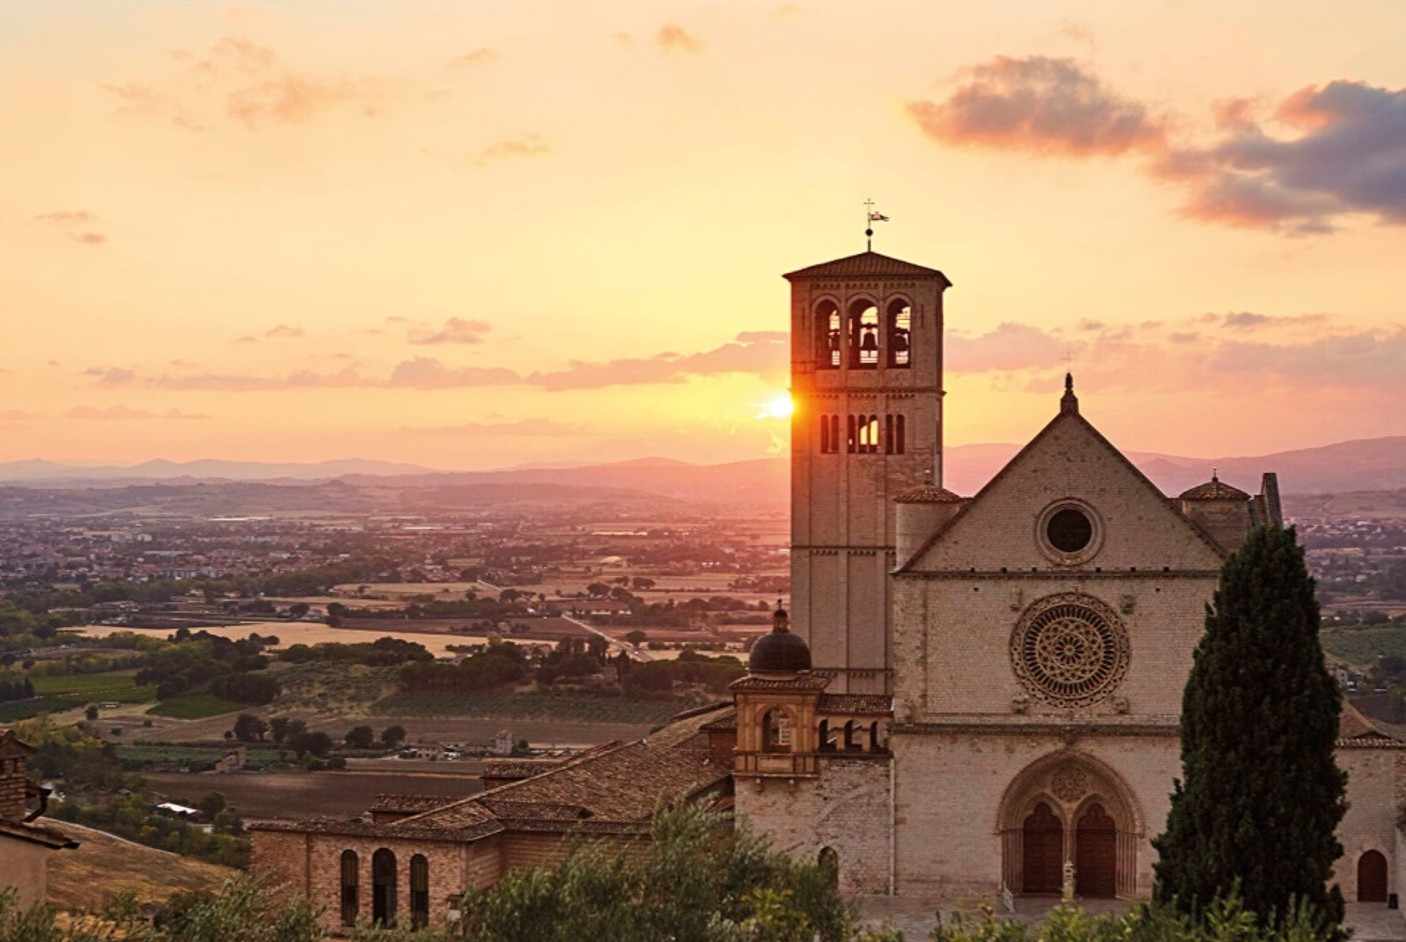 St. Francis church, Assisi